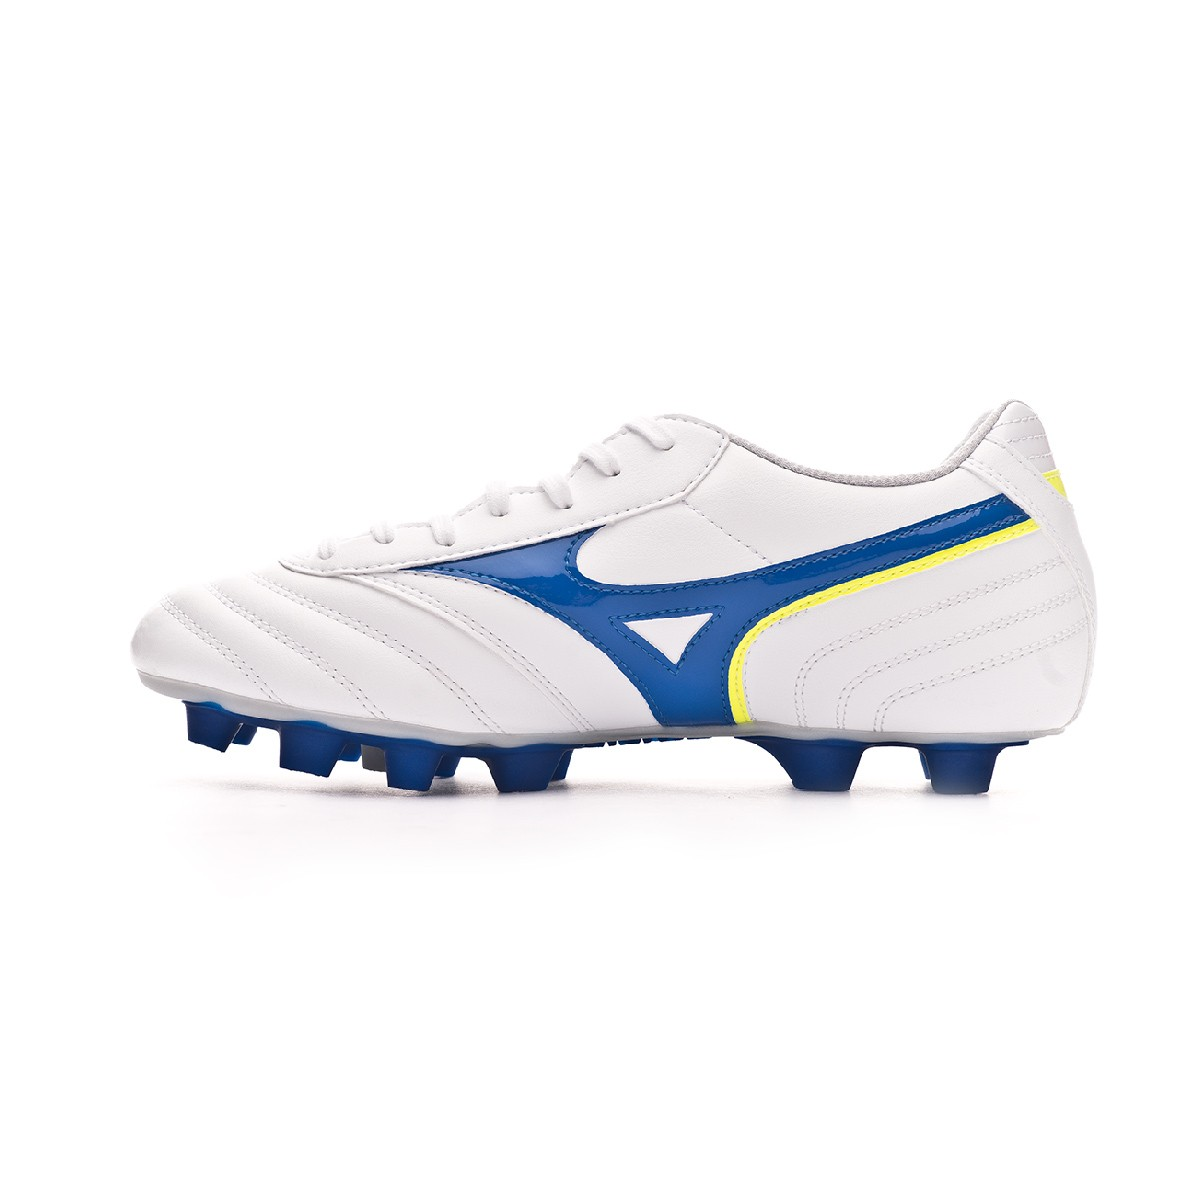 75872cc8c36a3 Chuteira Mizuno MRL Club MD White-Wave cup blue-Safety yellow - Loja de  futebol Fútbol Emotion